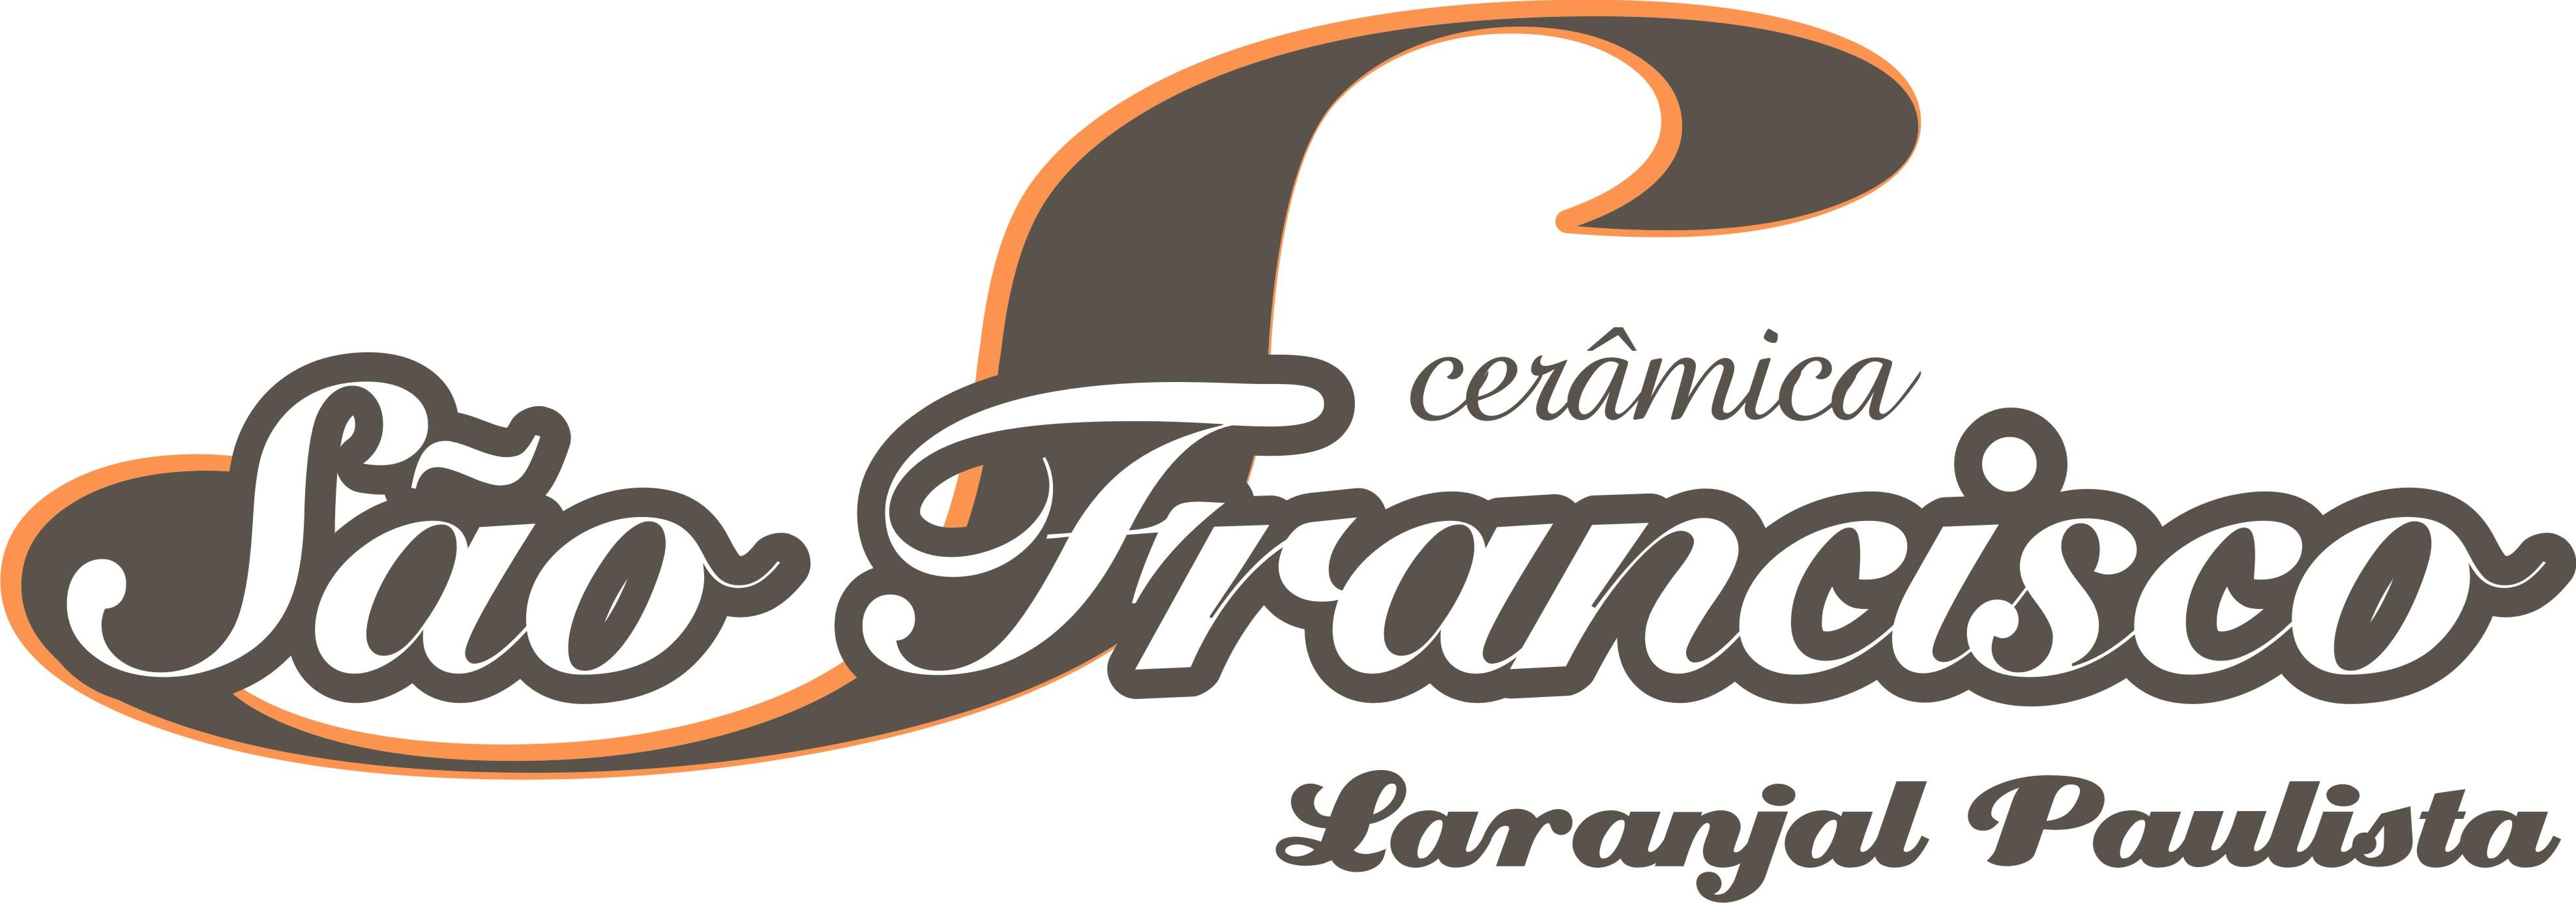 Cerâmica São Francisco - Laranjal Paulista